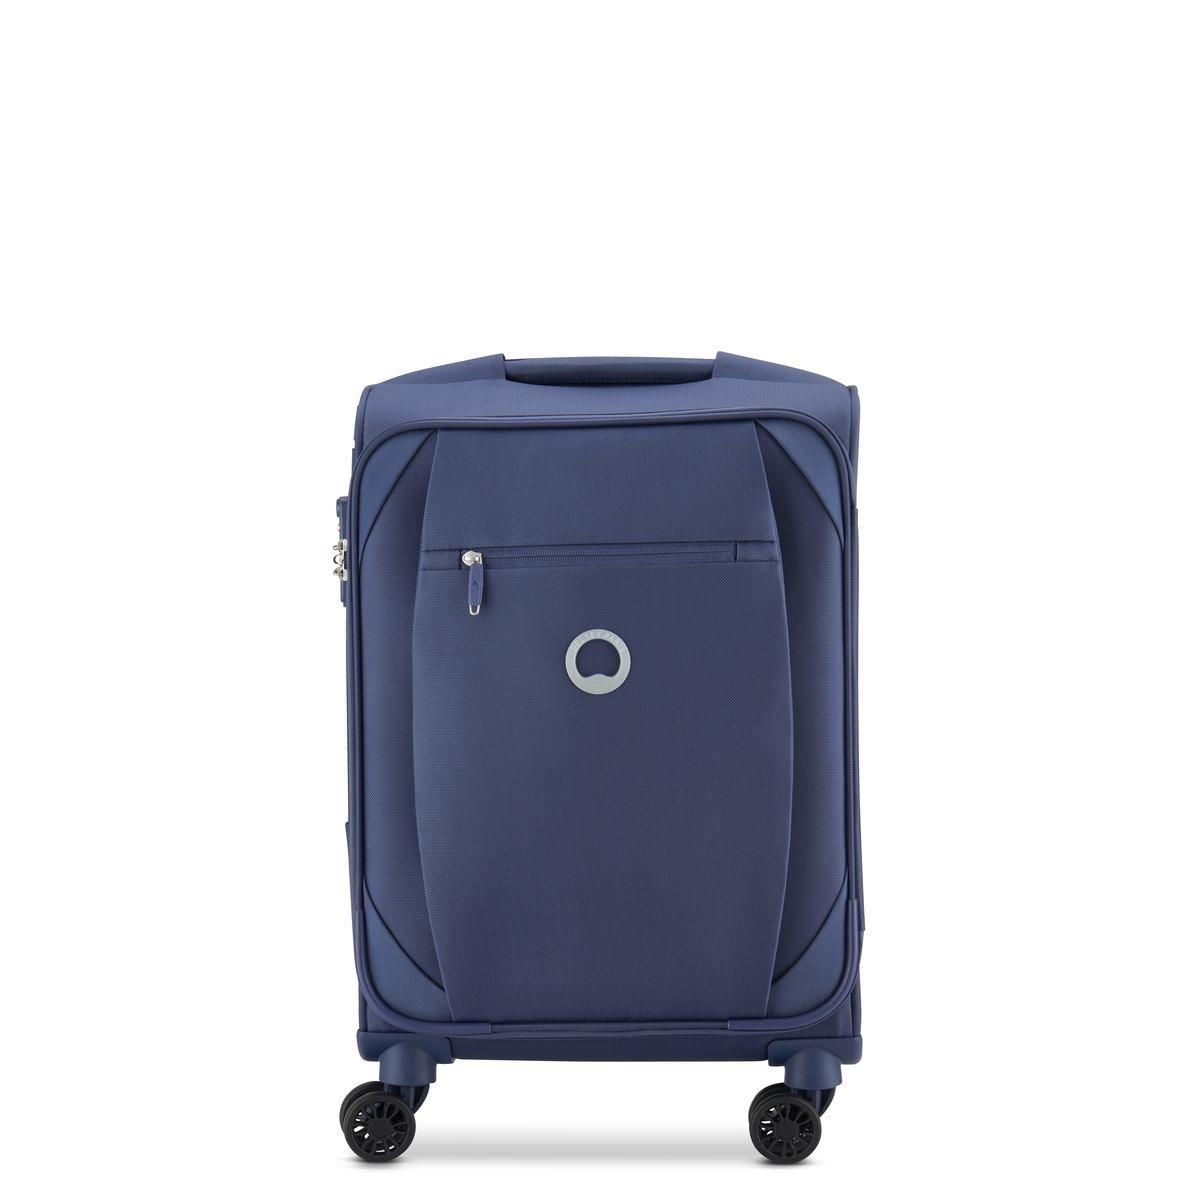 Delsey Βαλίτσα καμπίνας 55x35x23cm σειρά Rami Blue